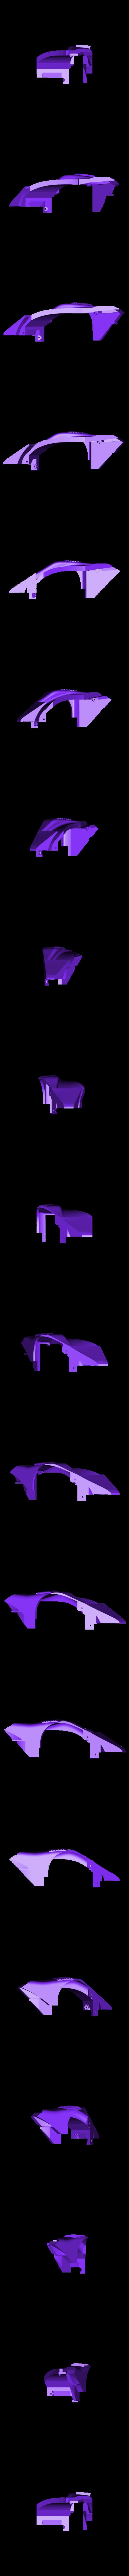 orange front right.stl Download free STL file 1991 Mazda 787B 3d Printed RC Car • 3D printable template, brett